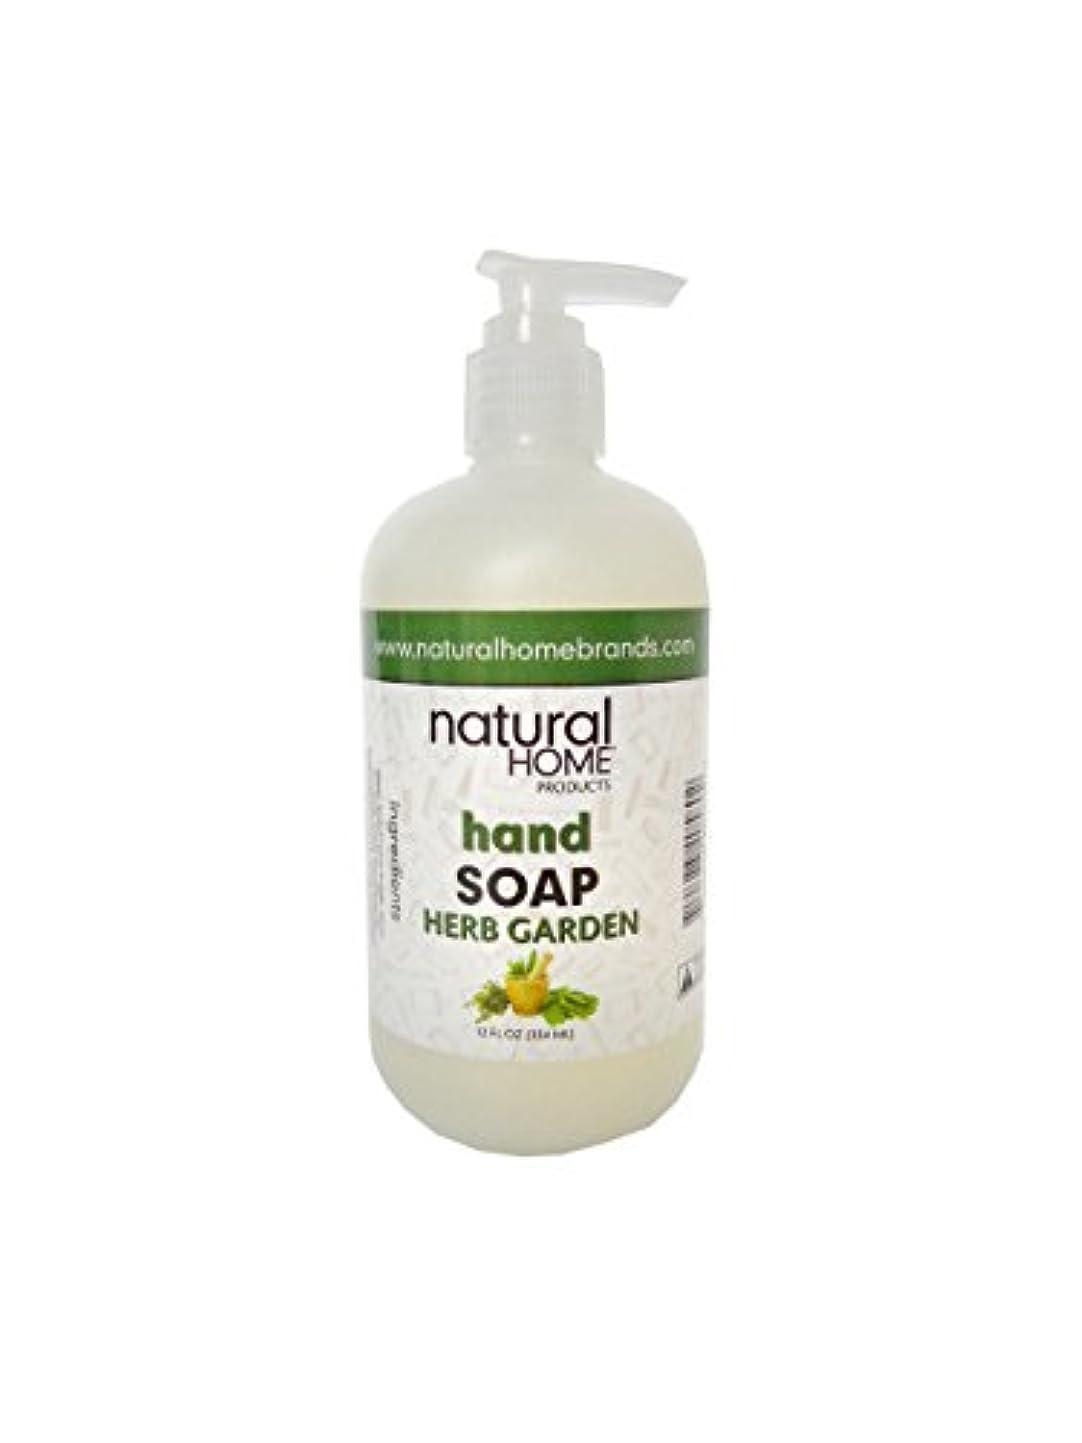 Natural Home Herb Garden Hand Soap, 350ml, Green